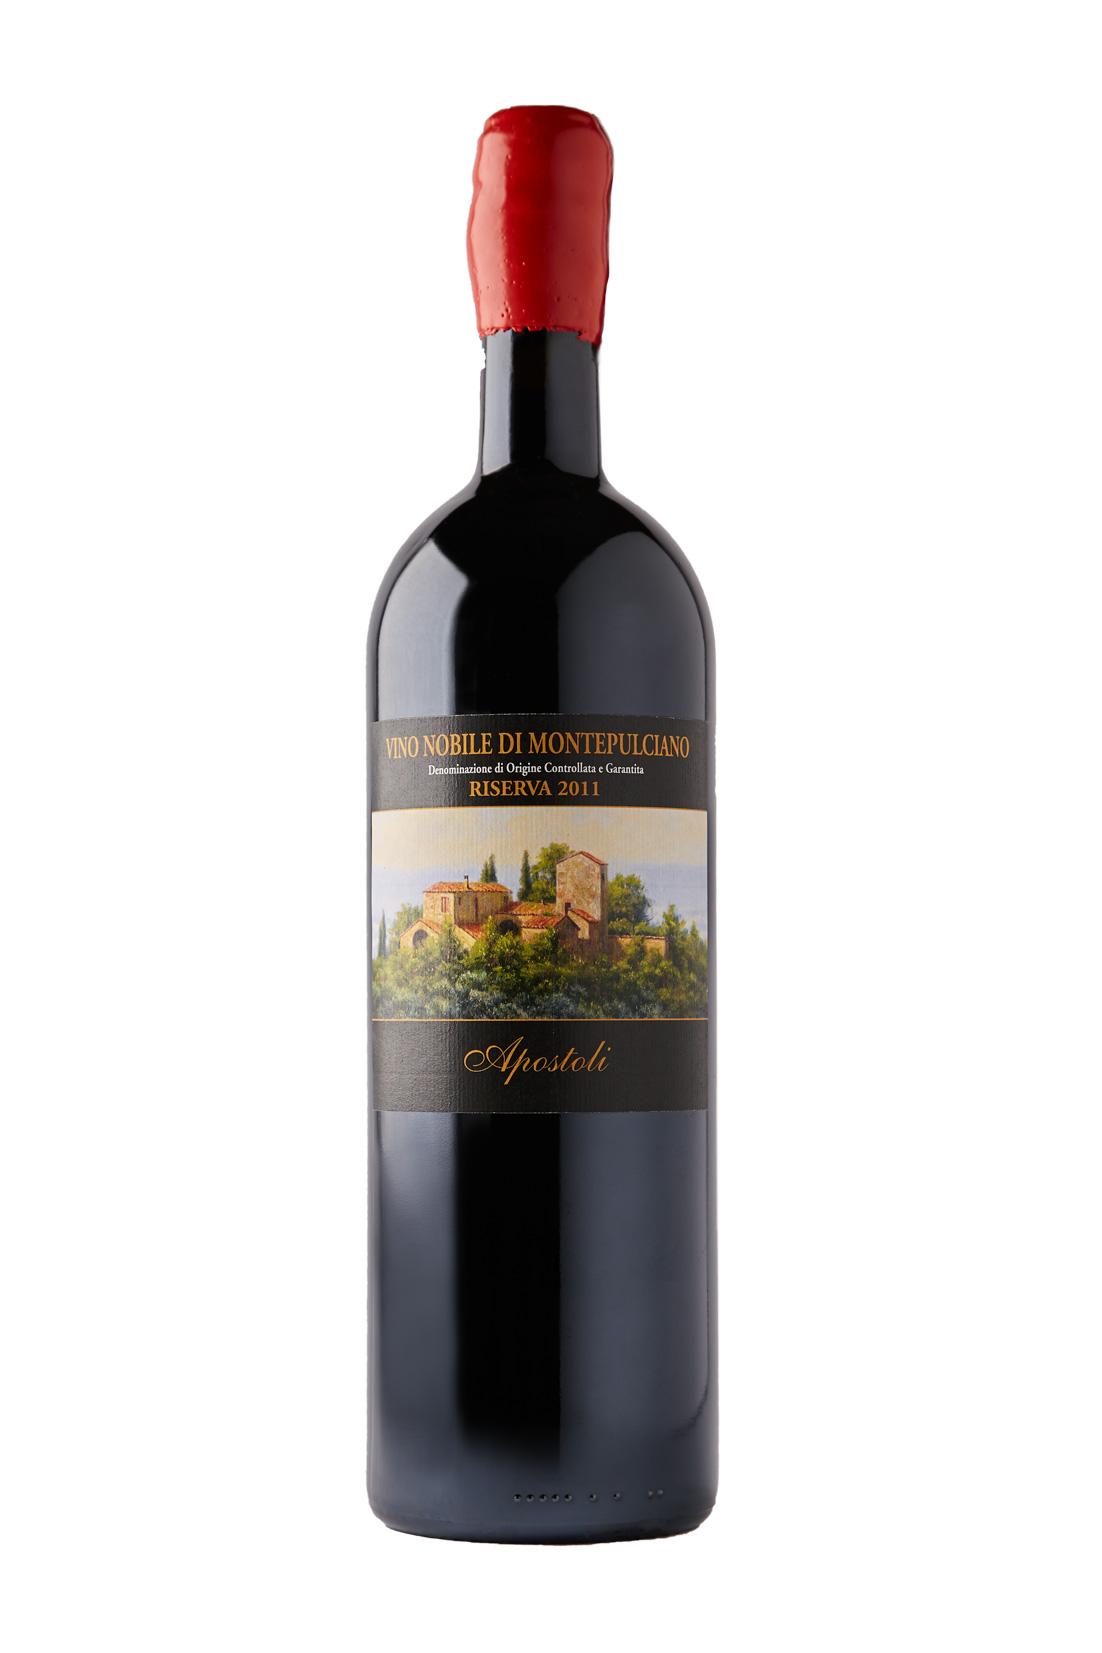 Magnumin viini Nobile di Montepulciano docg Riserva Apostoli 2012